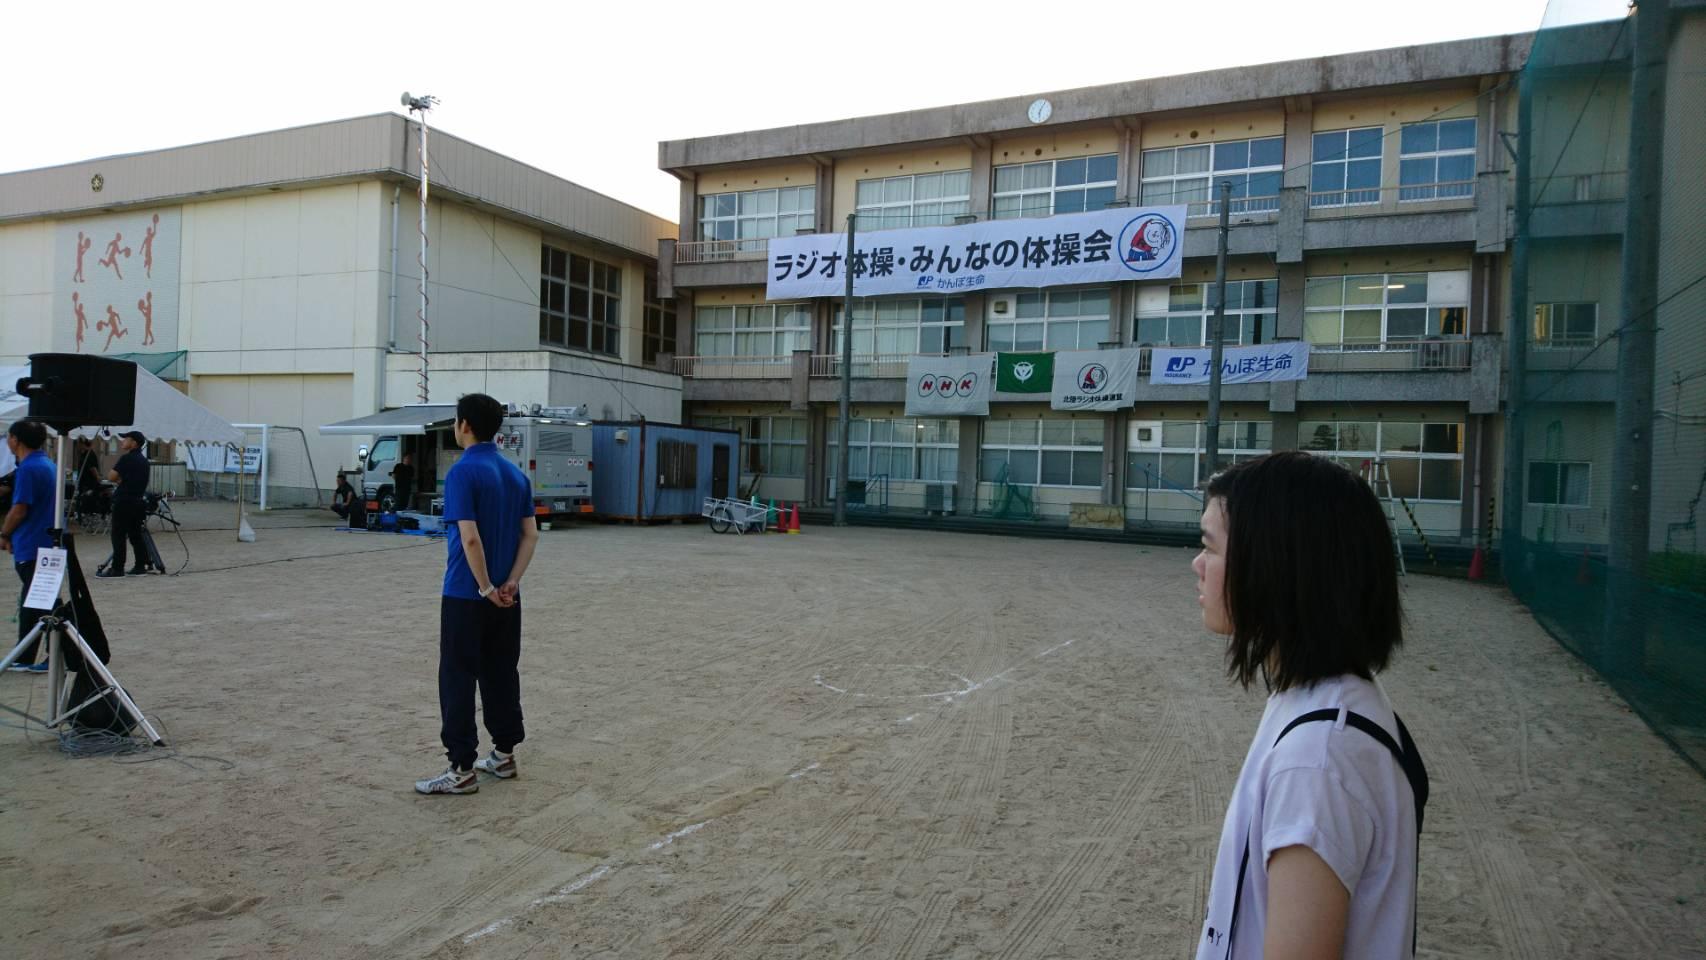 http://n-ko.jp/staffblog/20990000.jpg